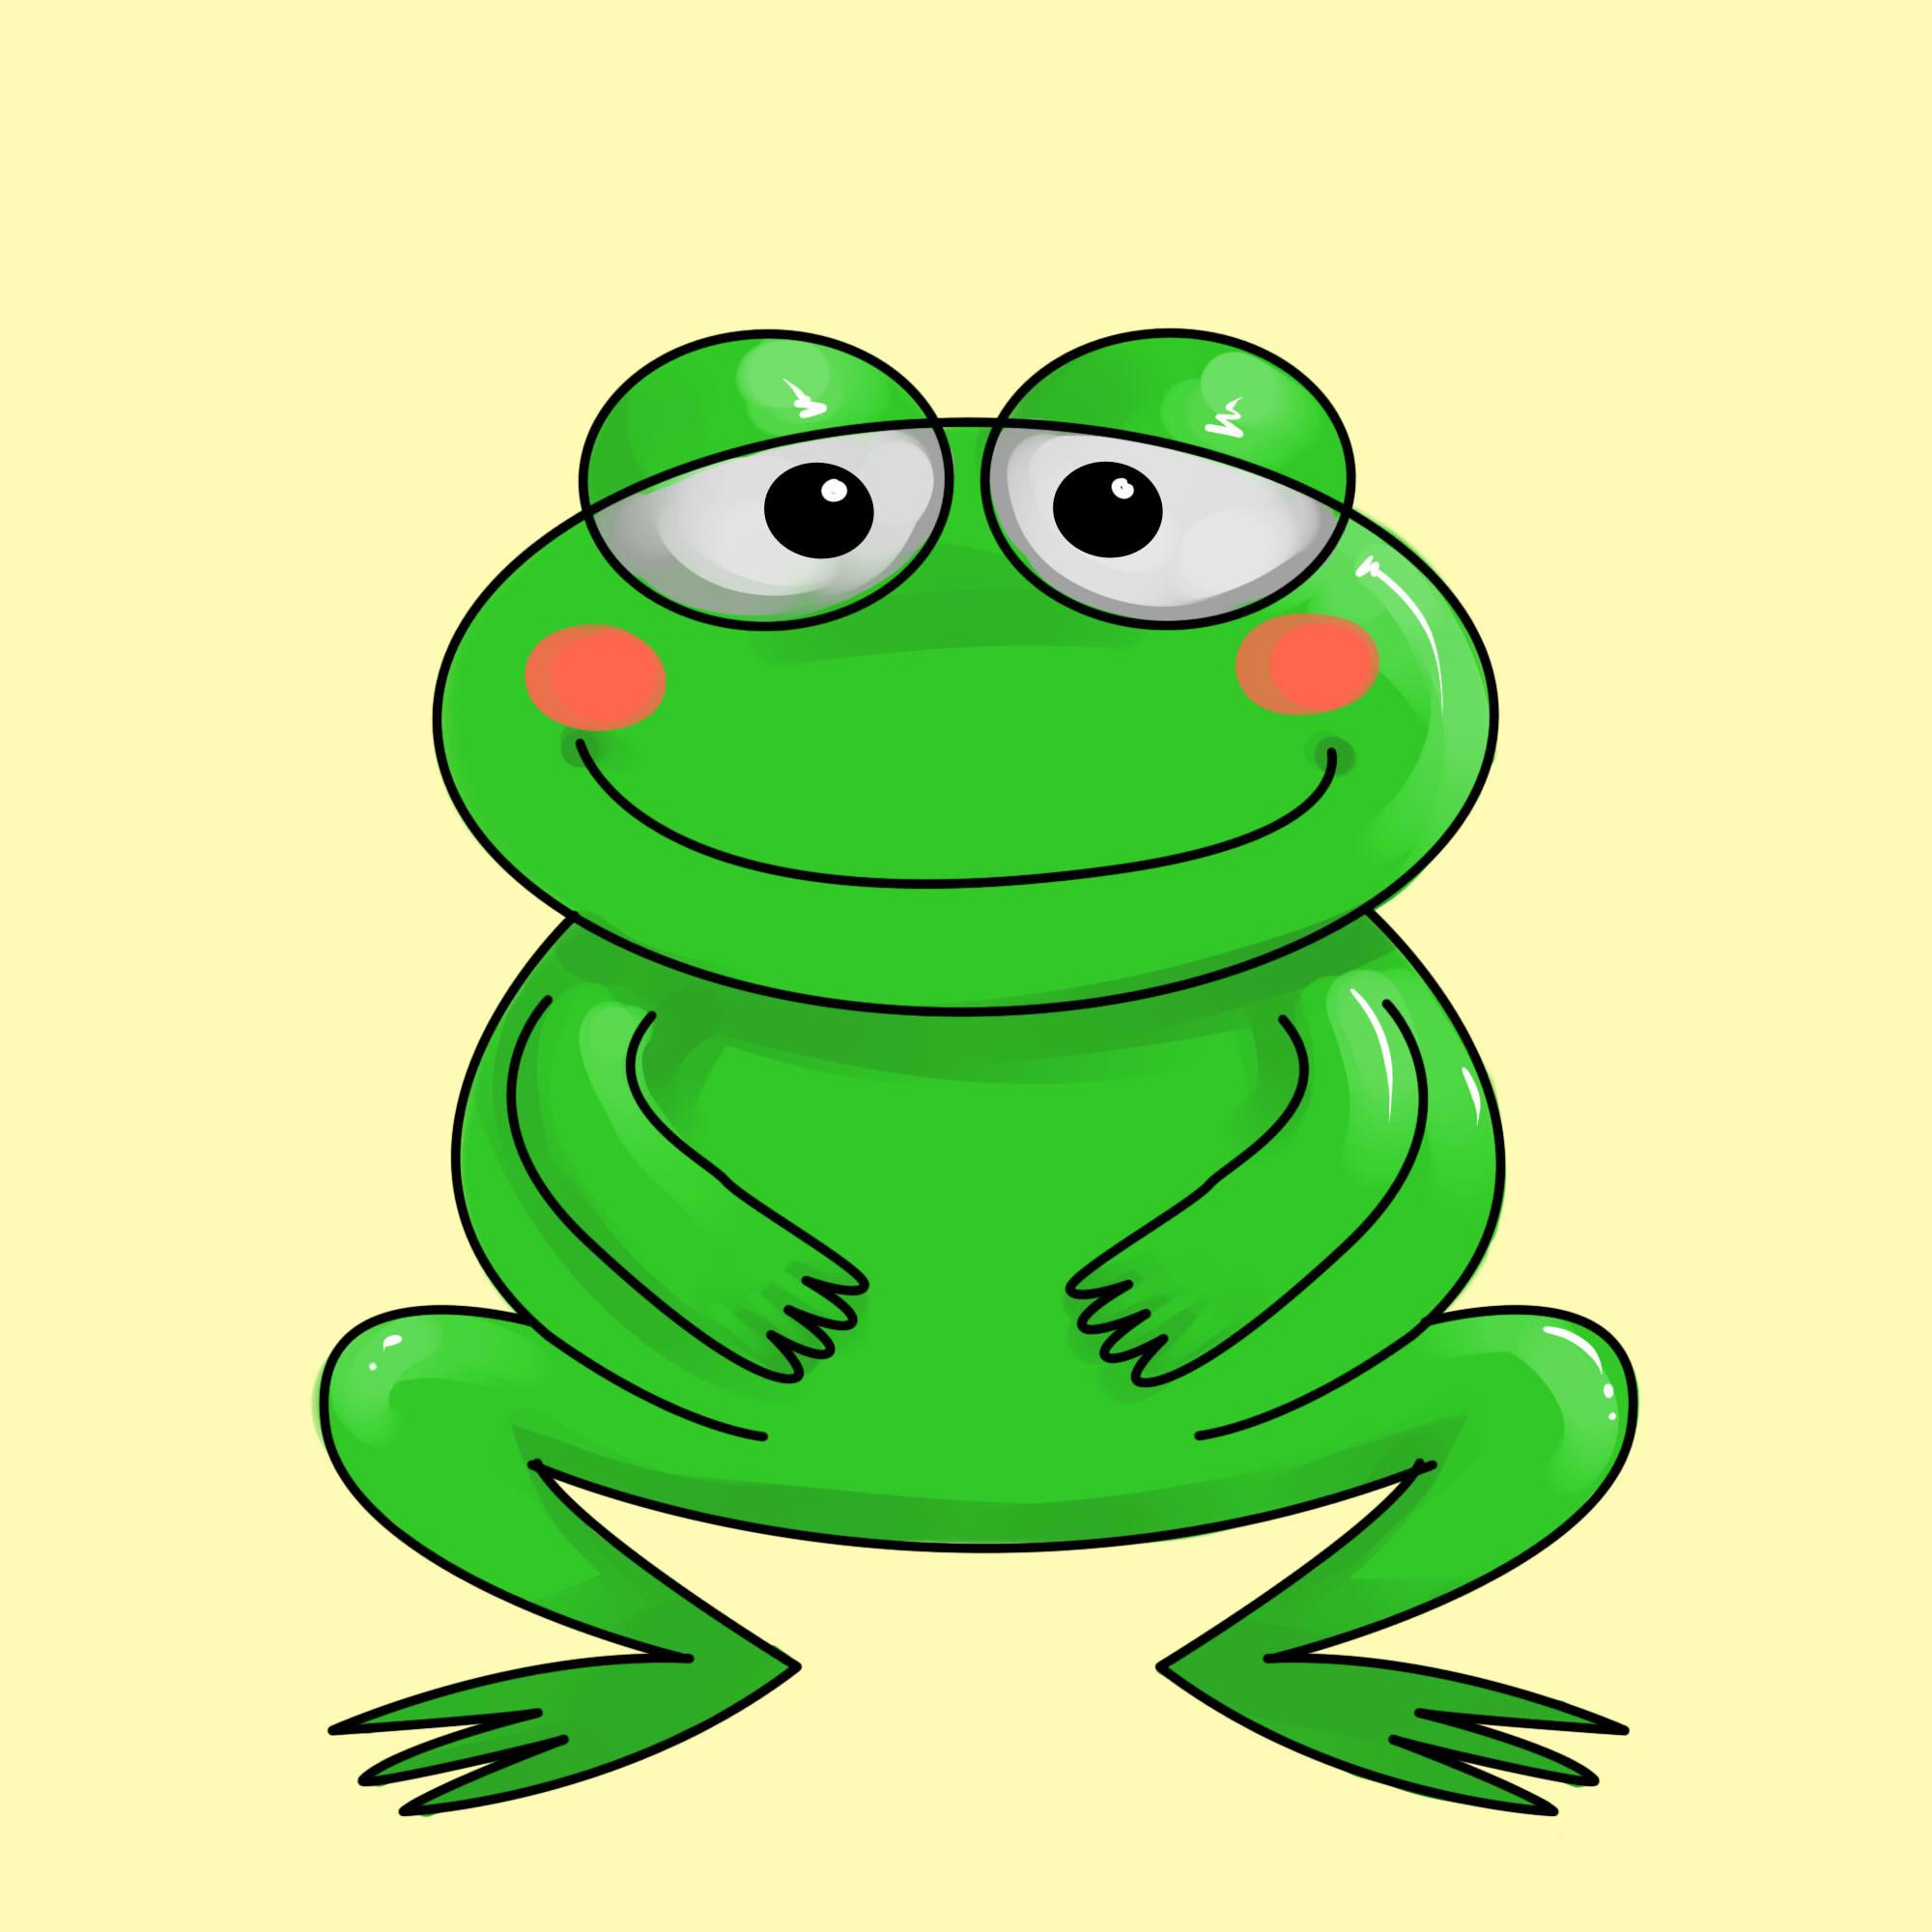 Cartoon Frog Wallpaper 46 images